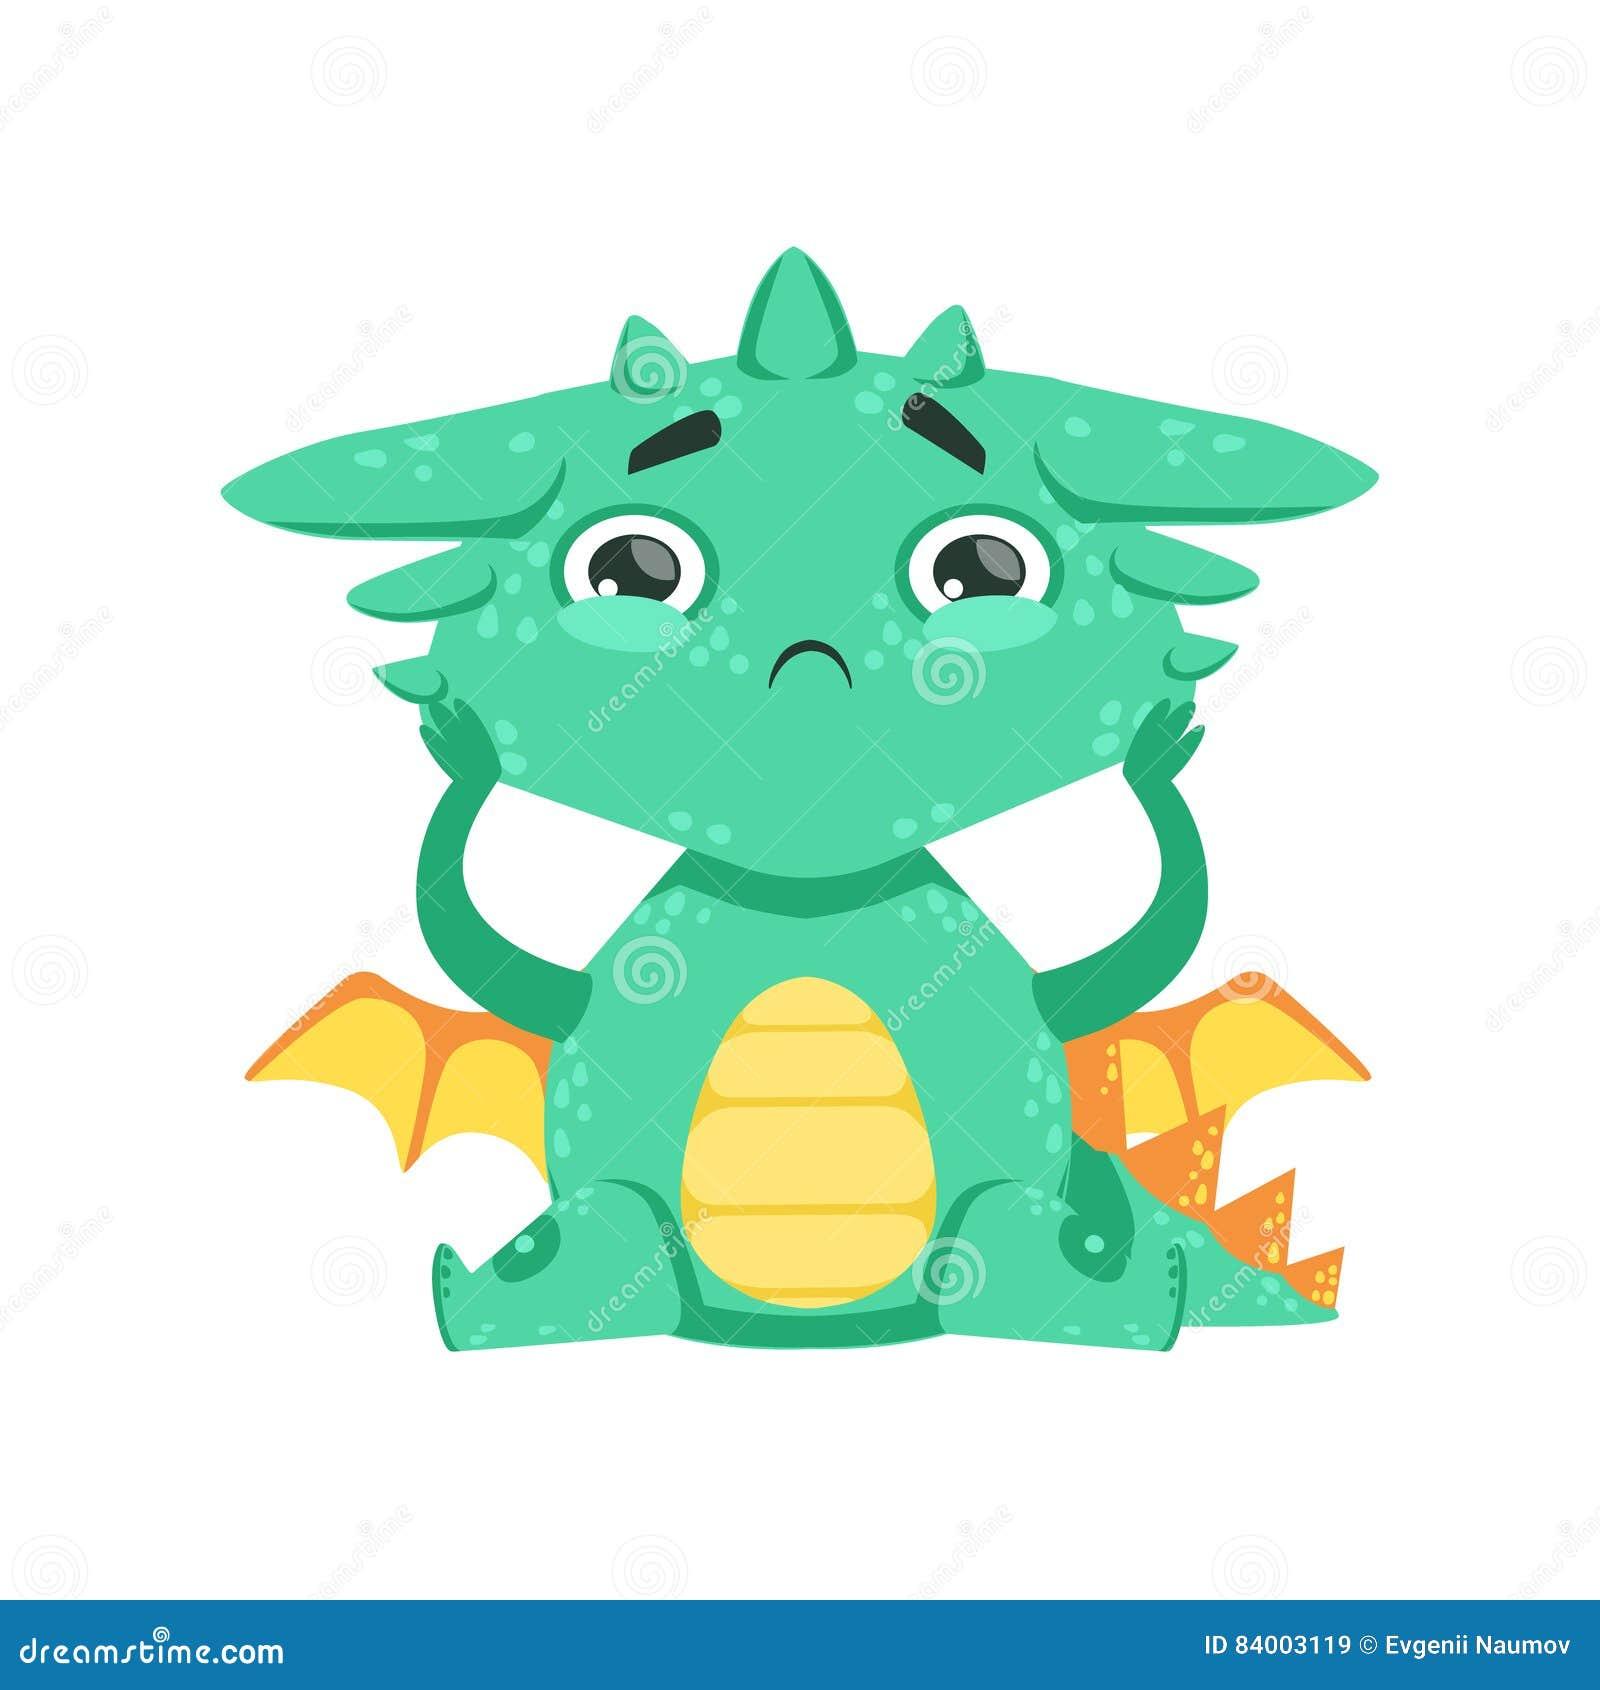 Peu d illustration de Dragon Feeling Lonely Cartoon Character Emoji de bébé de style d Anime